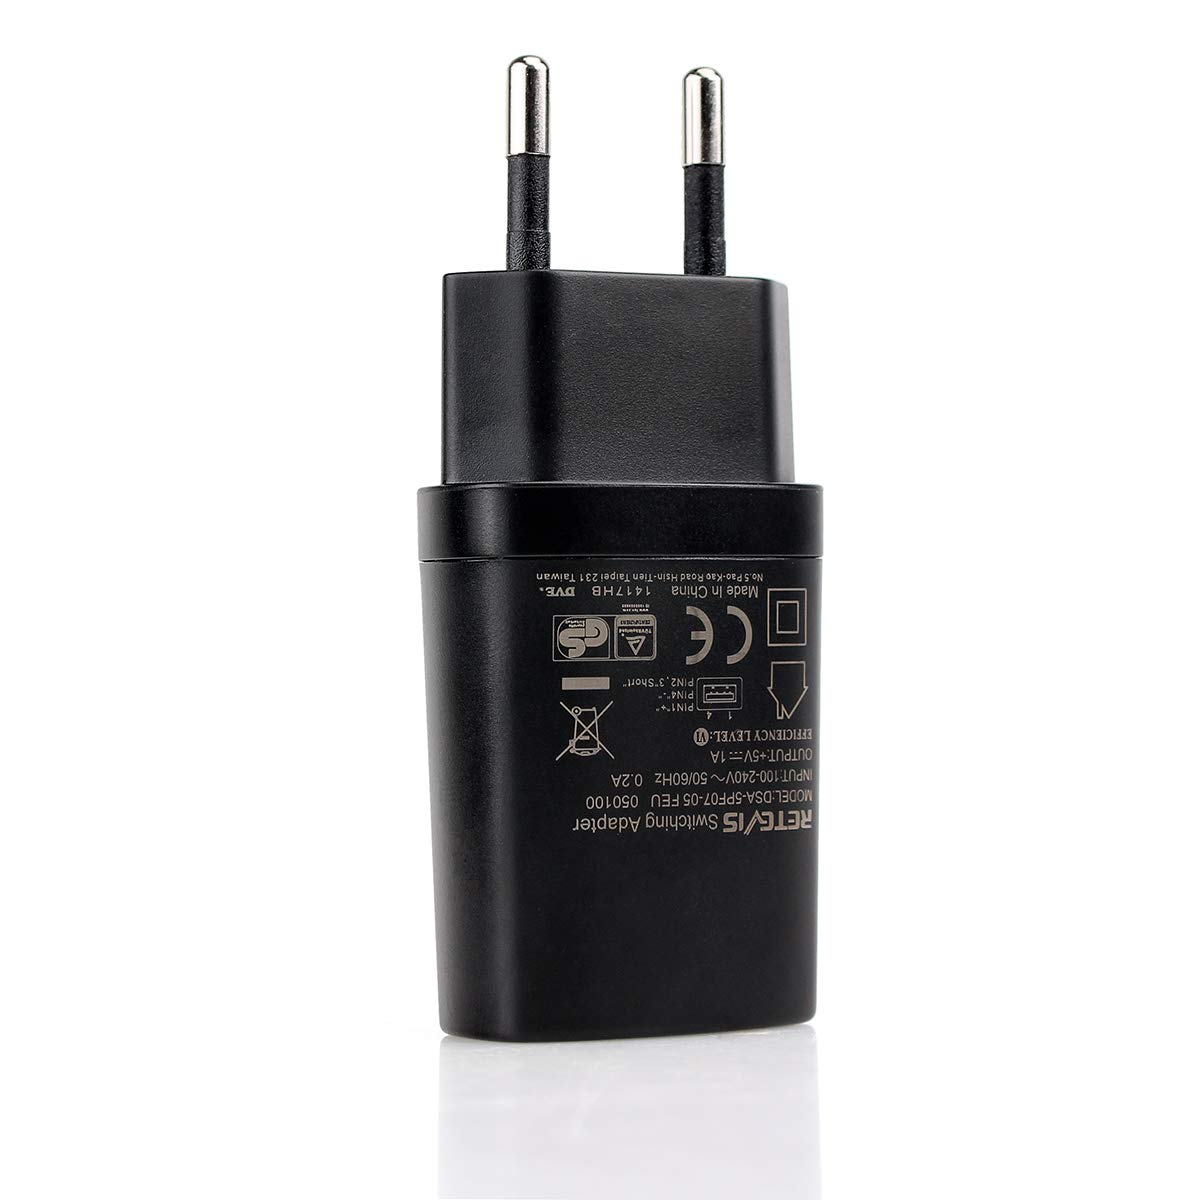 Retevis Adaptador USB Cargador 5V 1A Compatible con Walkie Talkie RT24 RT22 RT622 RT27 RT45 RT28 RT617 RT618 RT619 RT46 RT667 Baofeng BF-88E Caroger CB100 Radioddity GA-2S 2 Pacs